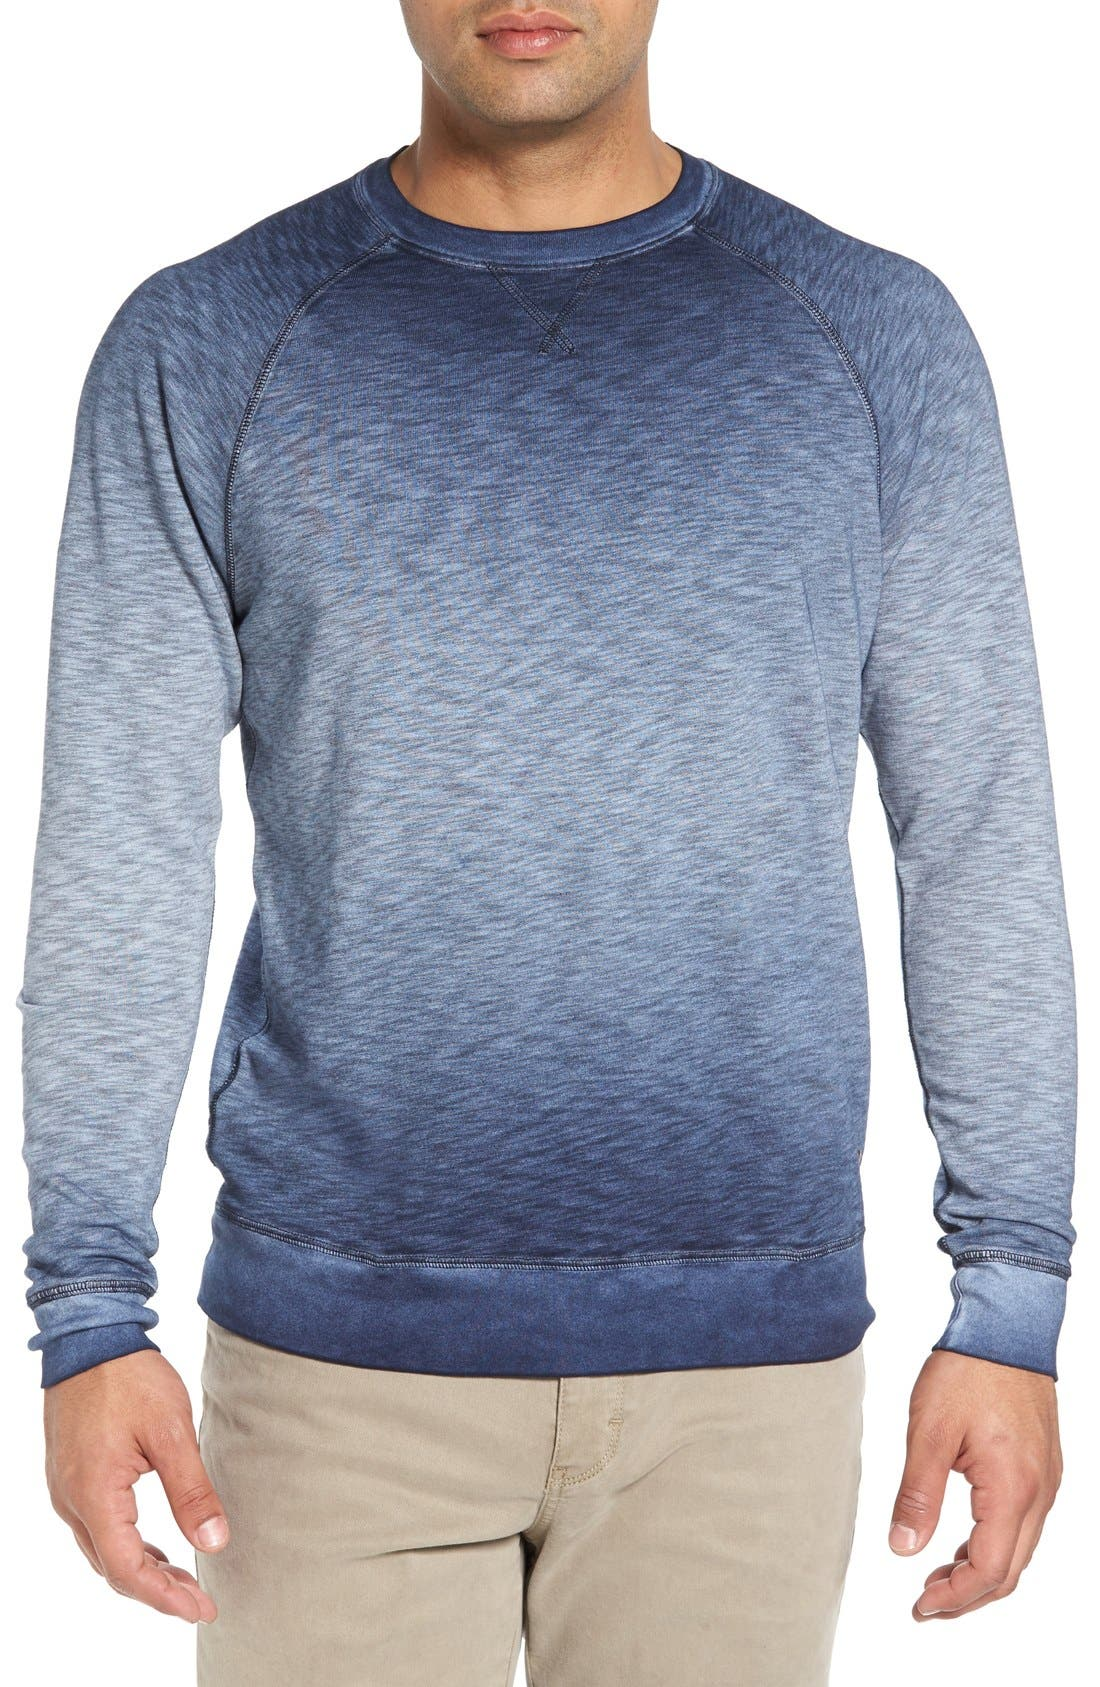 'Santiago' Ombré Crewneck Sweatshirt,                             Main thumbnail 1, color,                             Navy